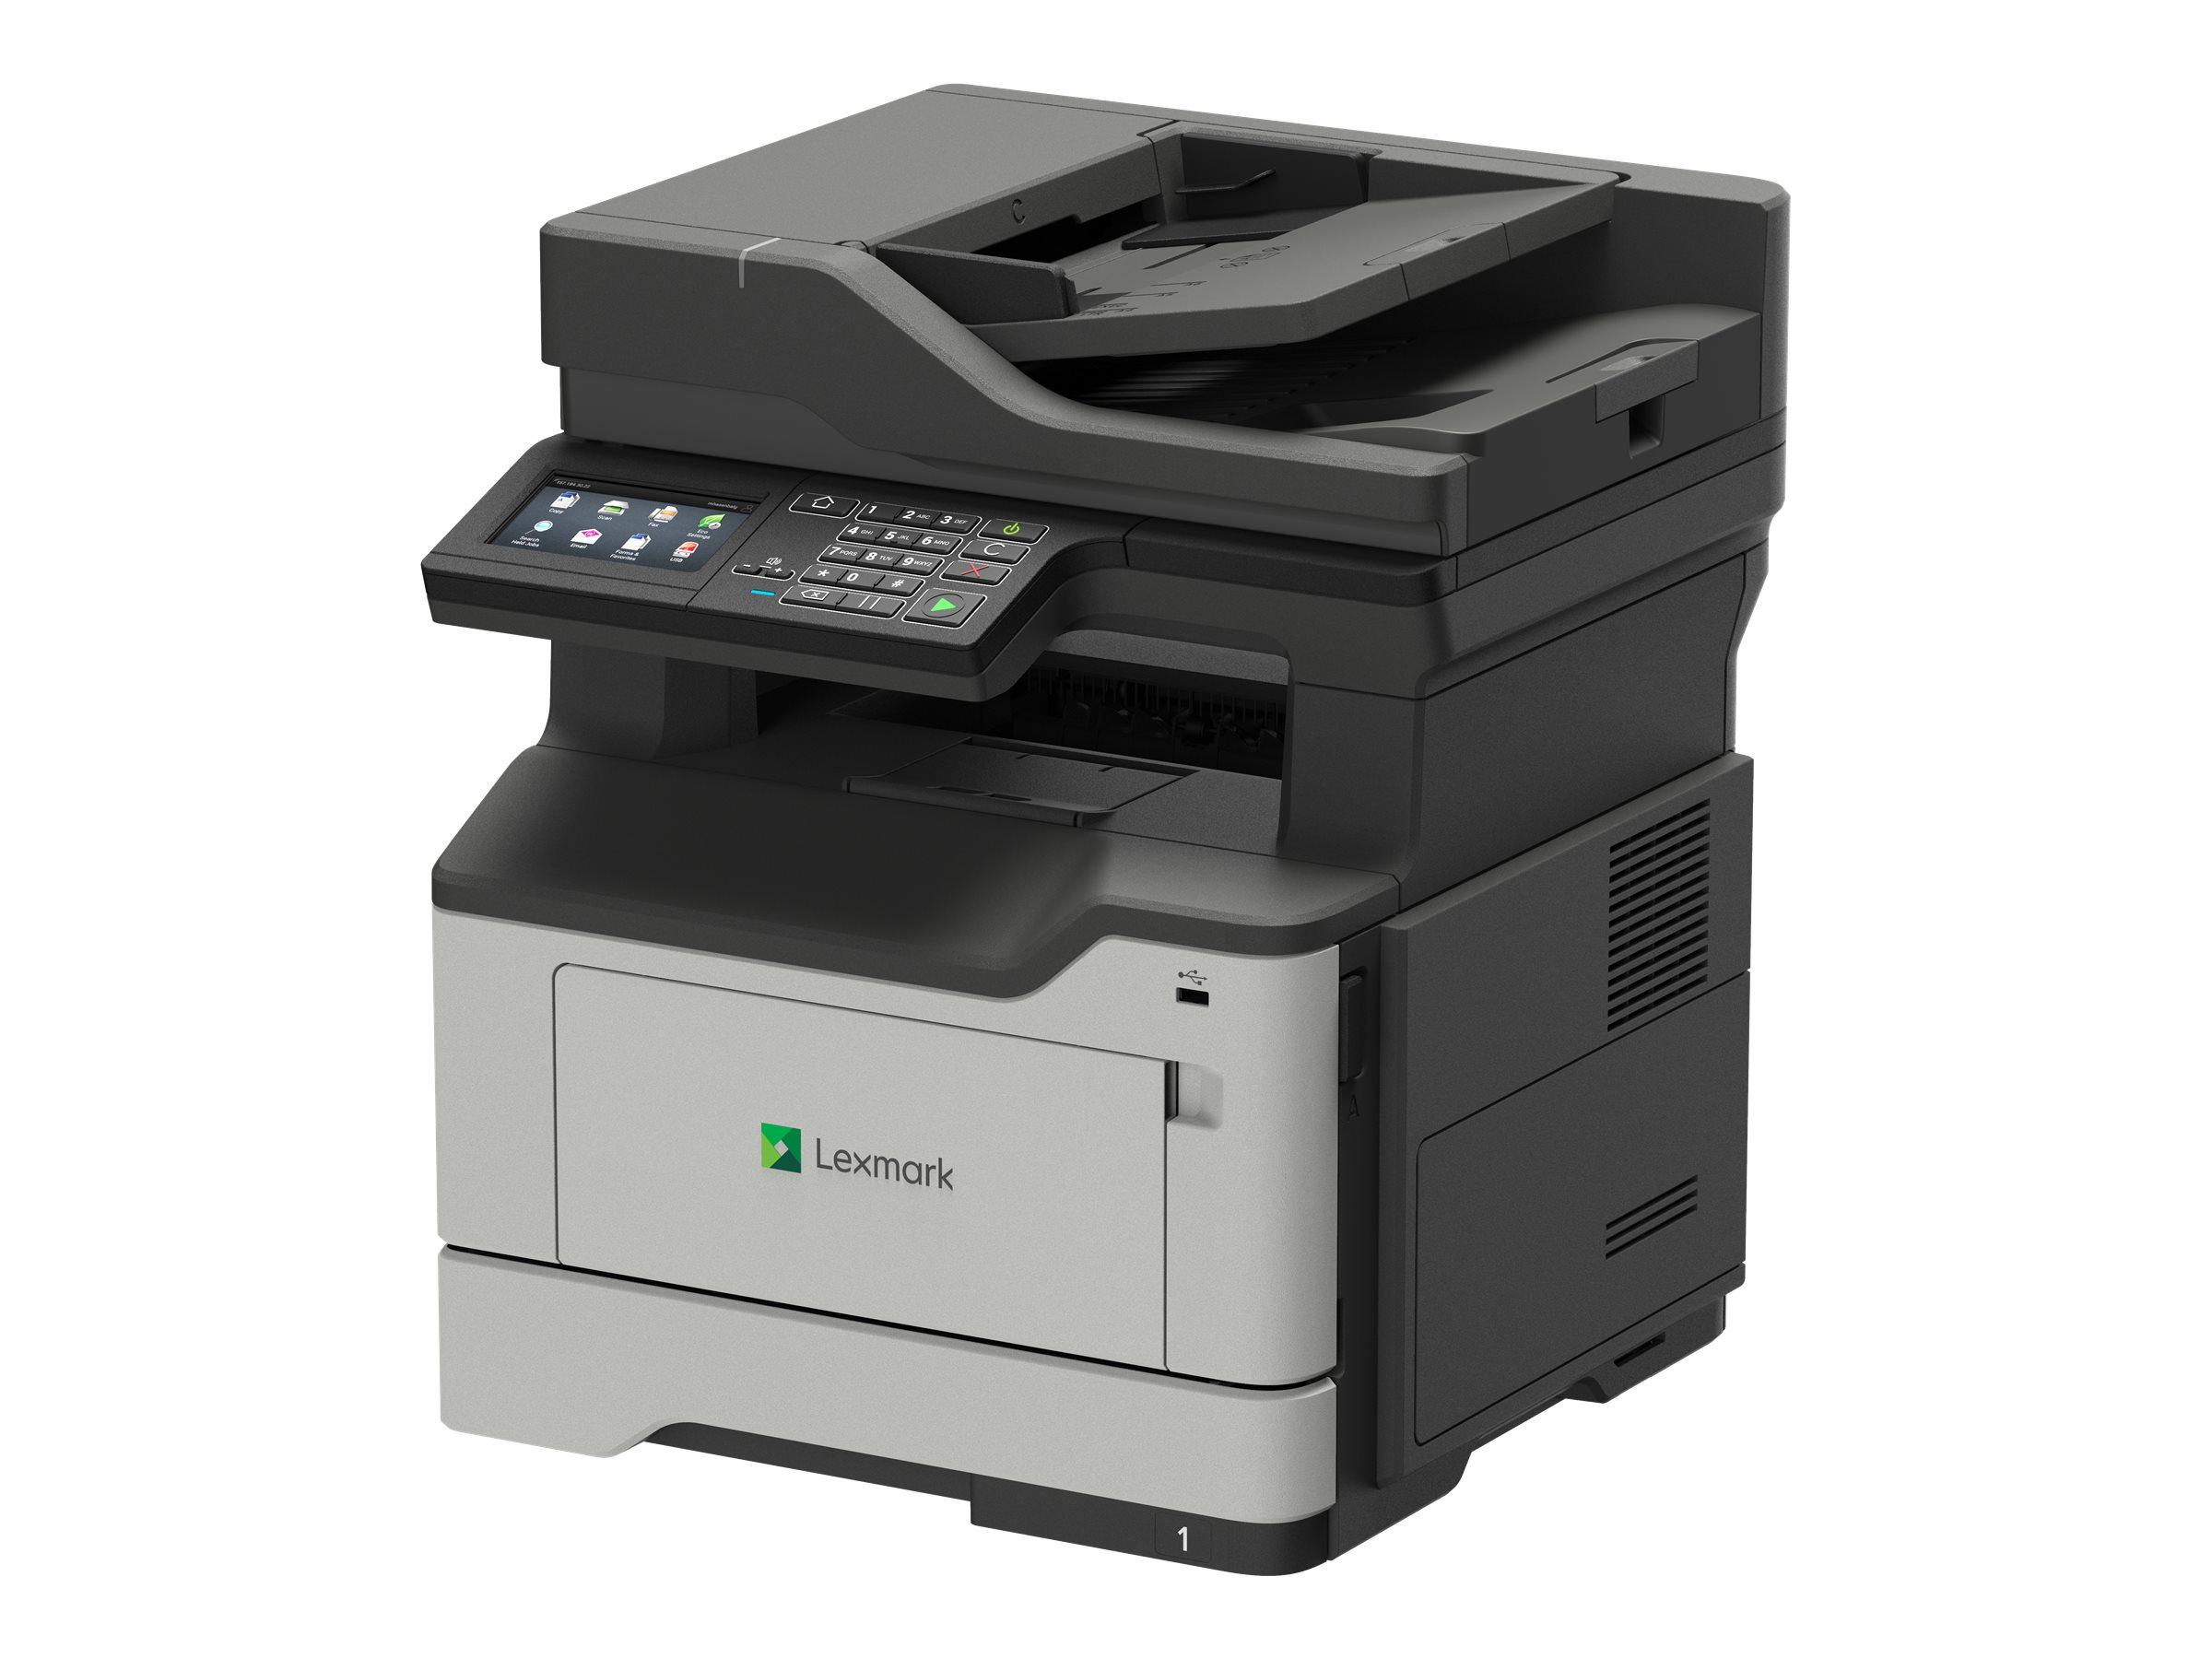 Mb2442adwe multifunktionsdrucker s w laser 215 9 x 355 6 mm original a4 legal medien 9320574 36sc730